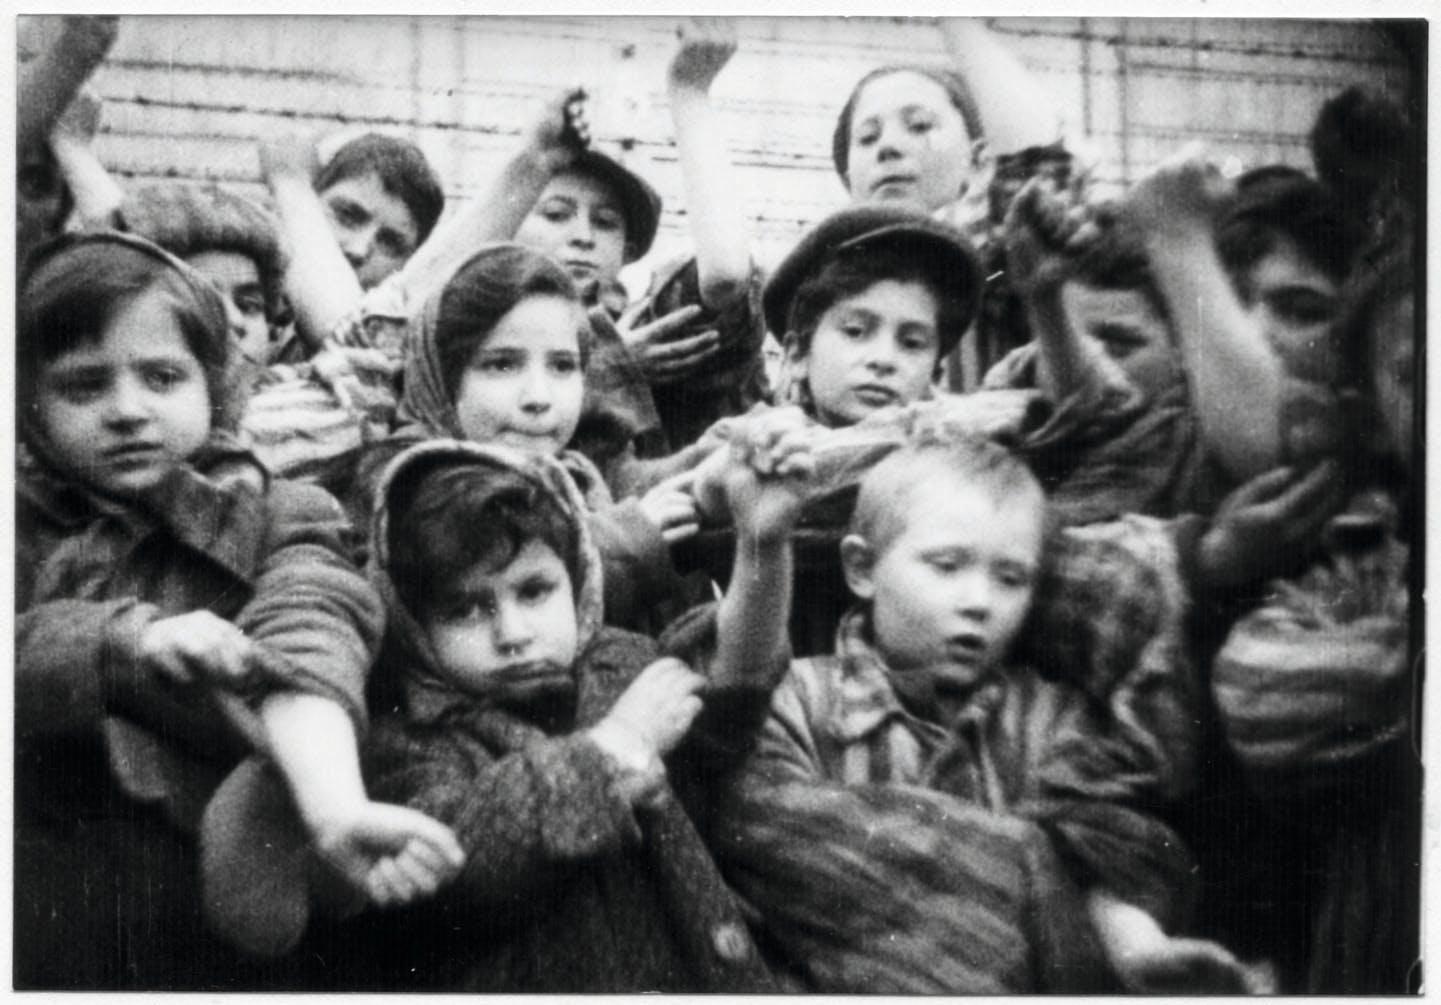 Barn som överlevde Auschwitz